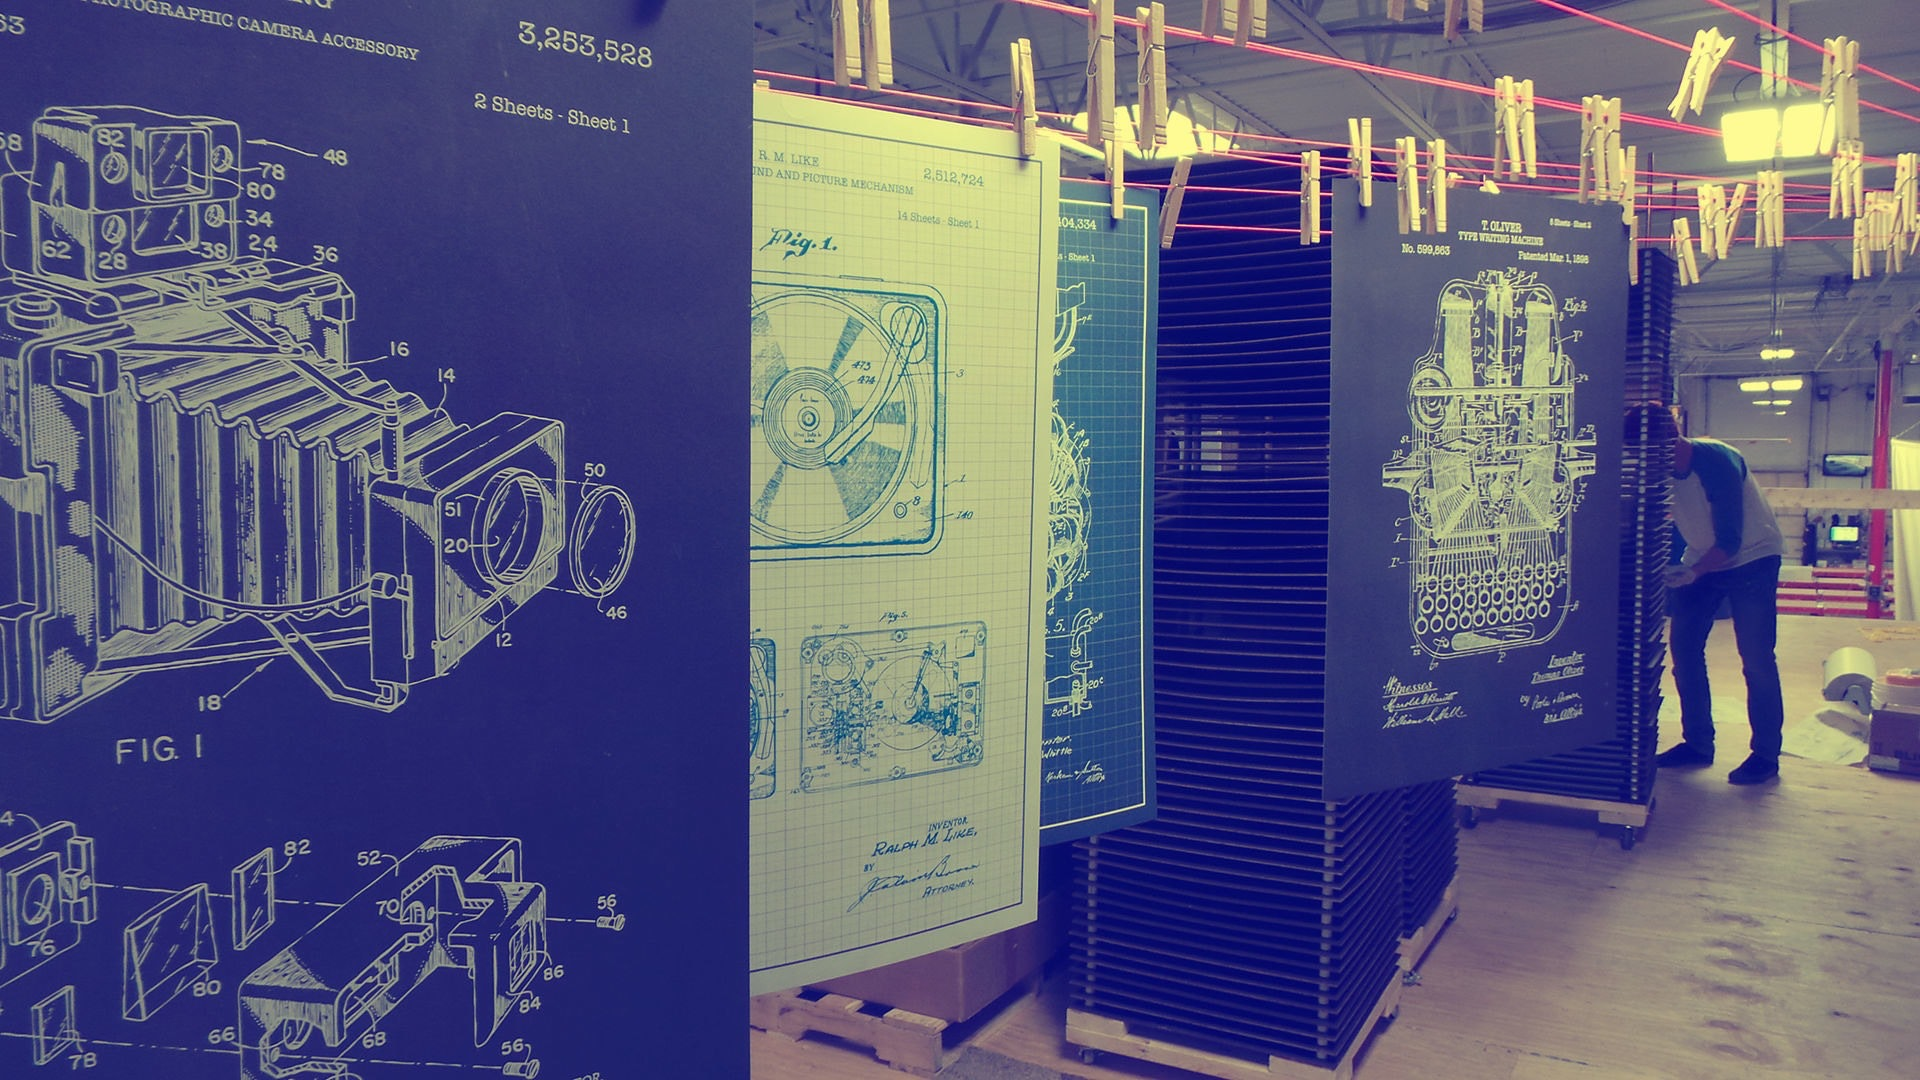 Inked and Screened Firearm Prints